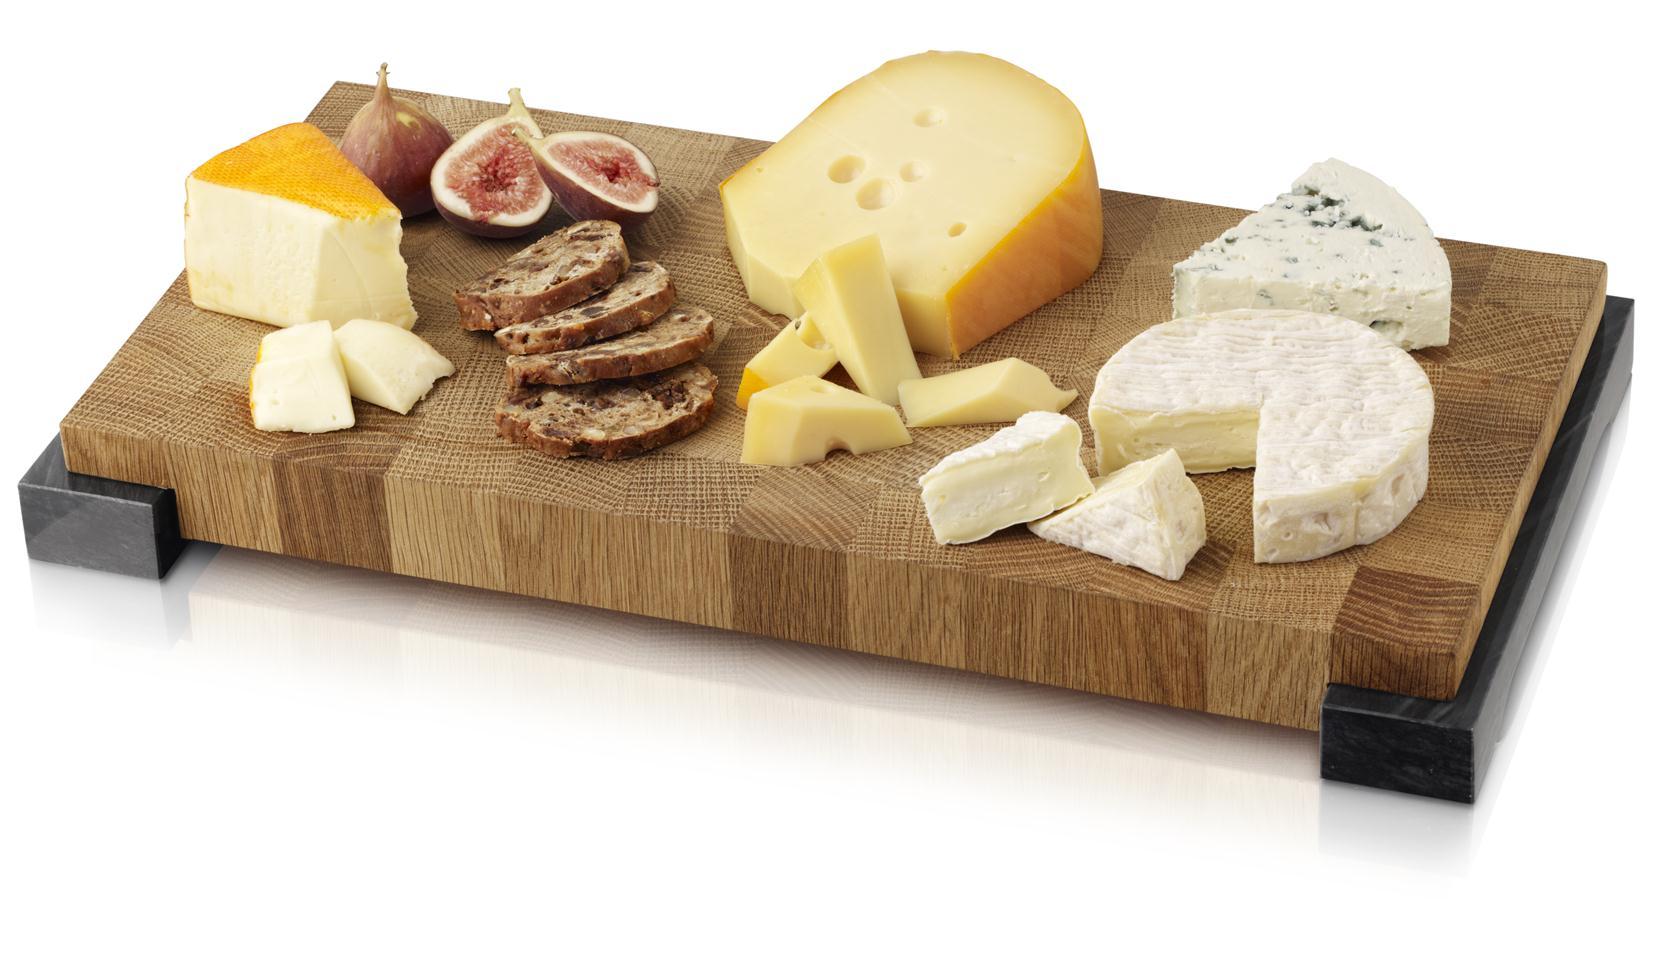 BOSKA, Käse- und Brotbrett auf Füßen, Eichenholz/ Marmor